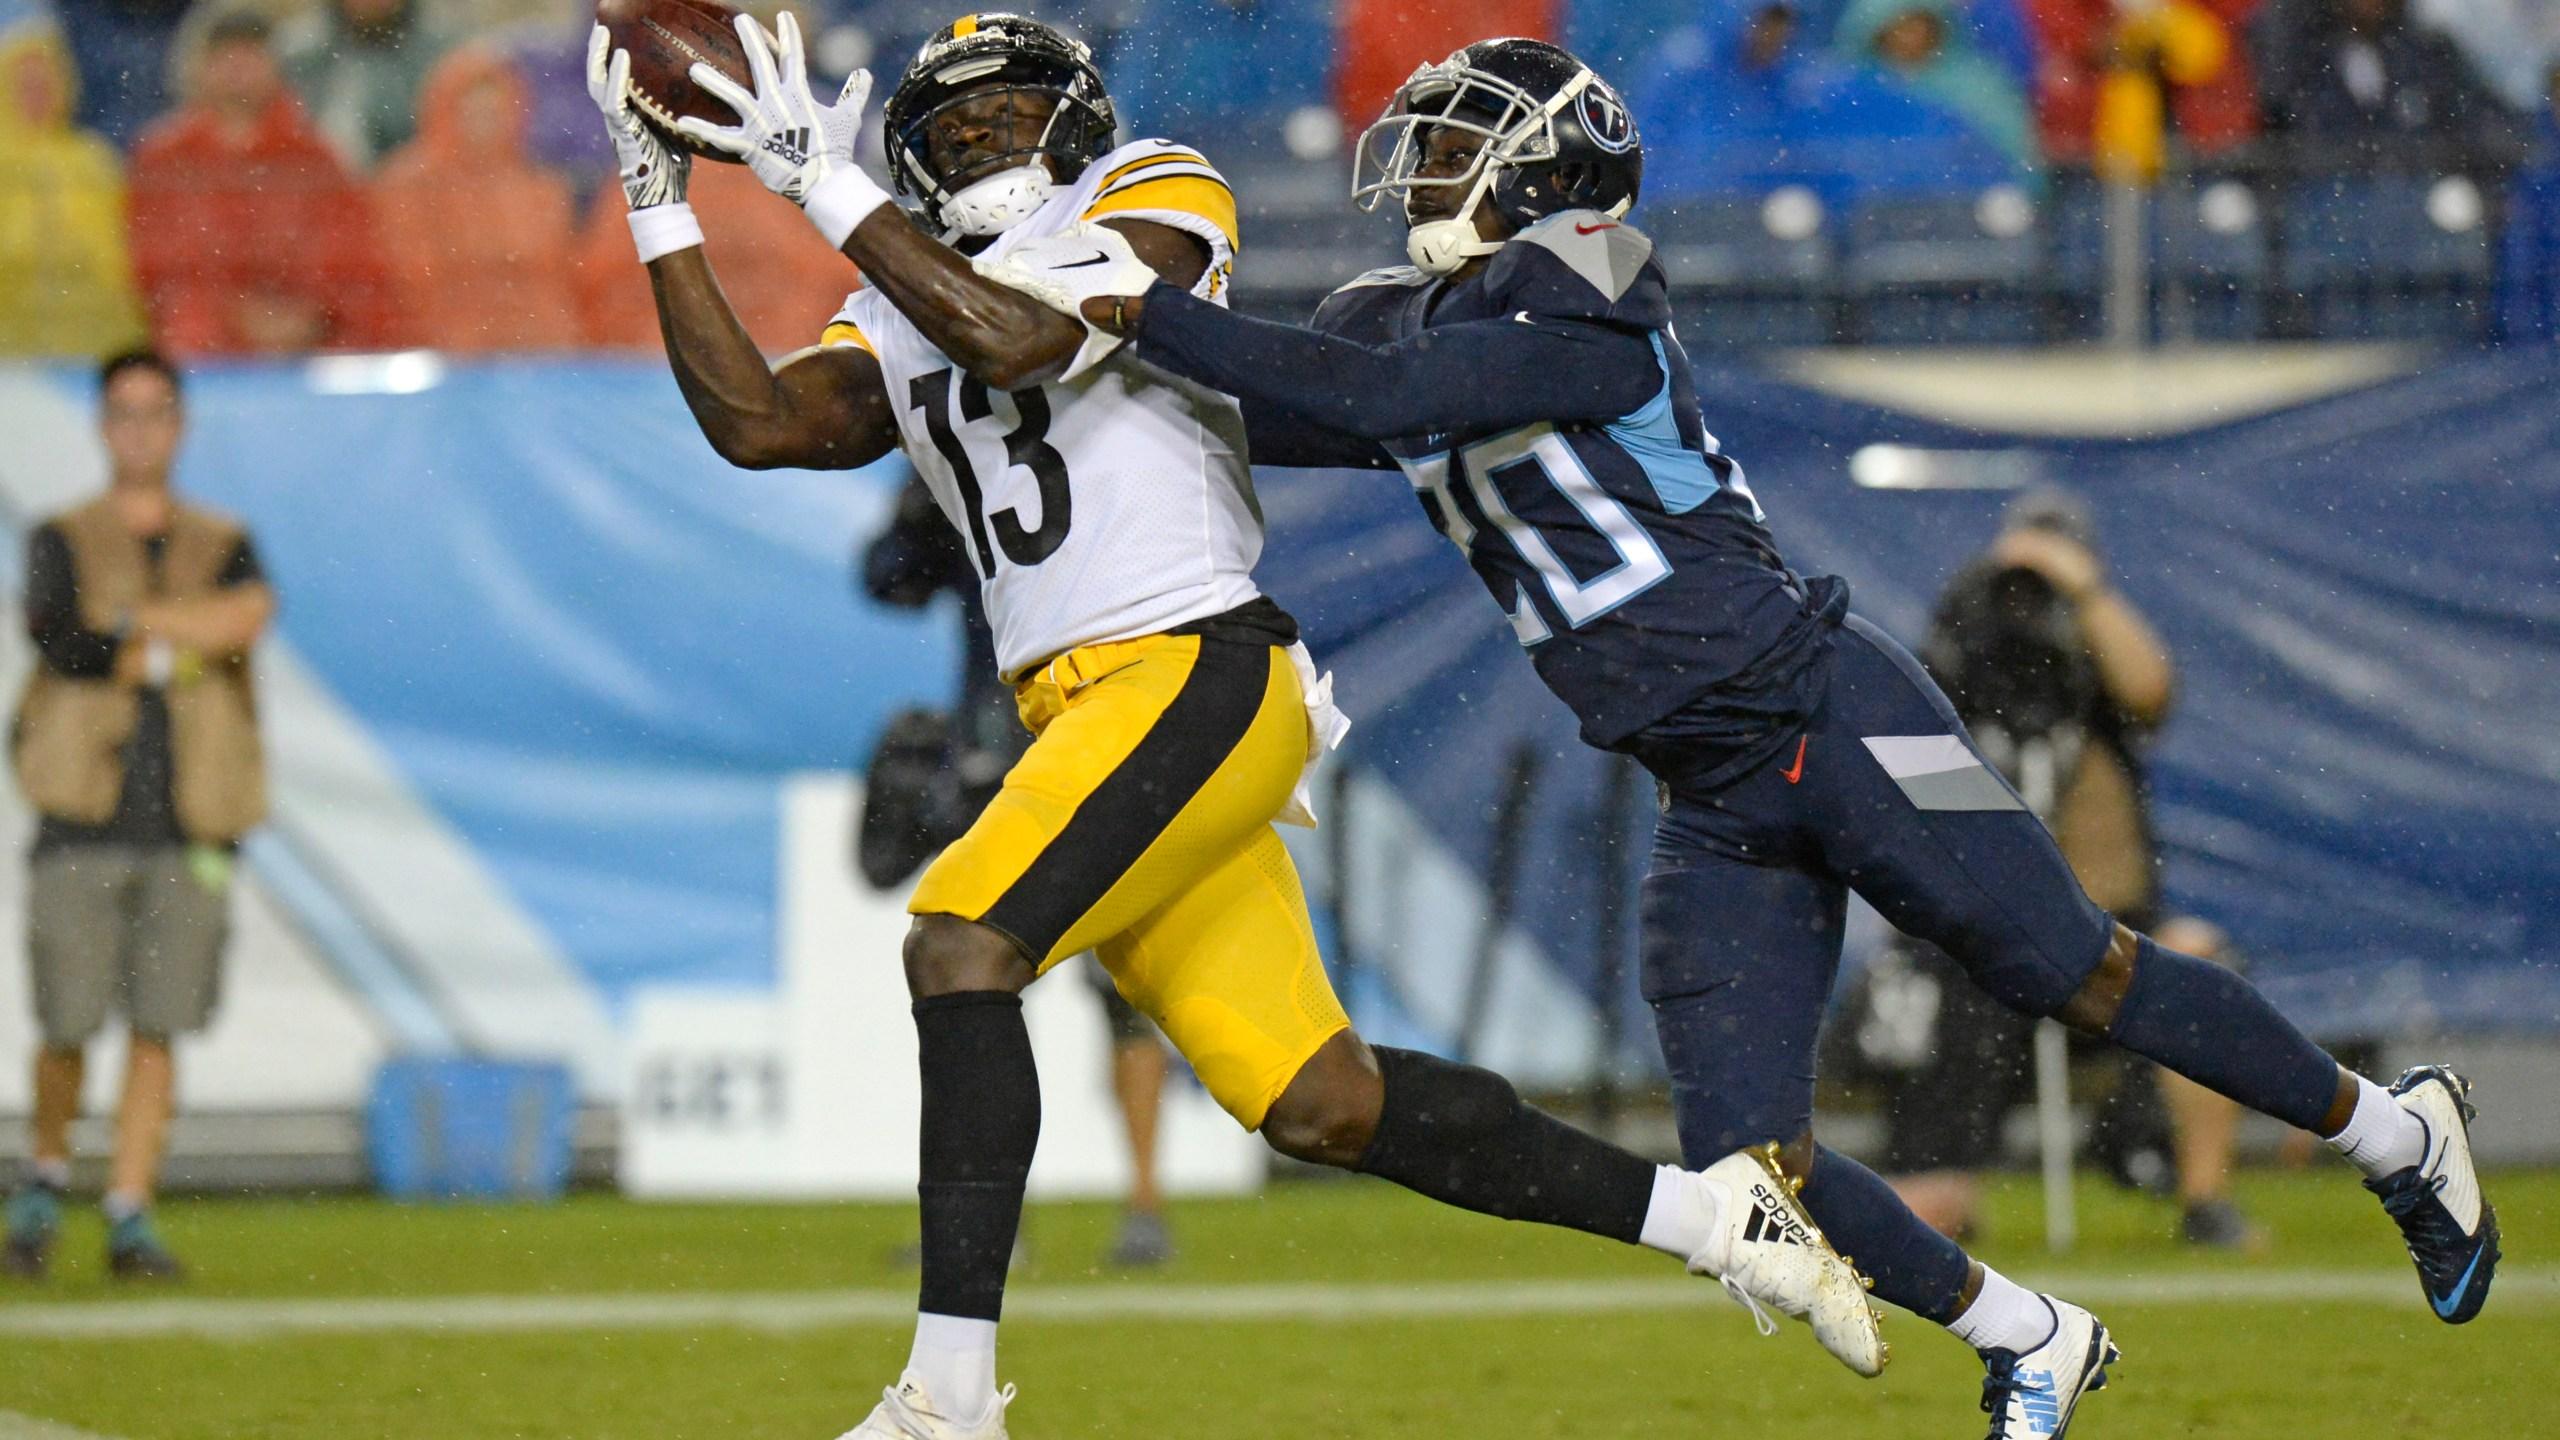 56bfeedd Big Ben makes preseason debut, Steelers beat Titans 18-6 | WKRN